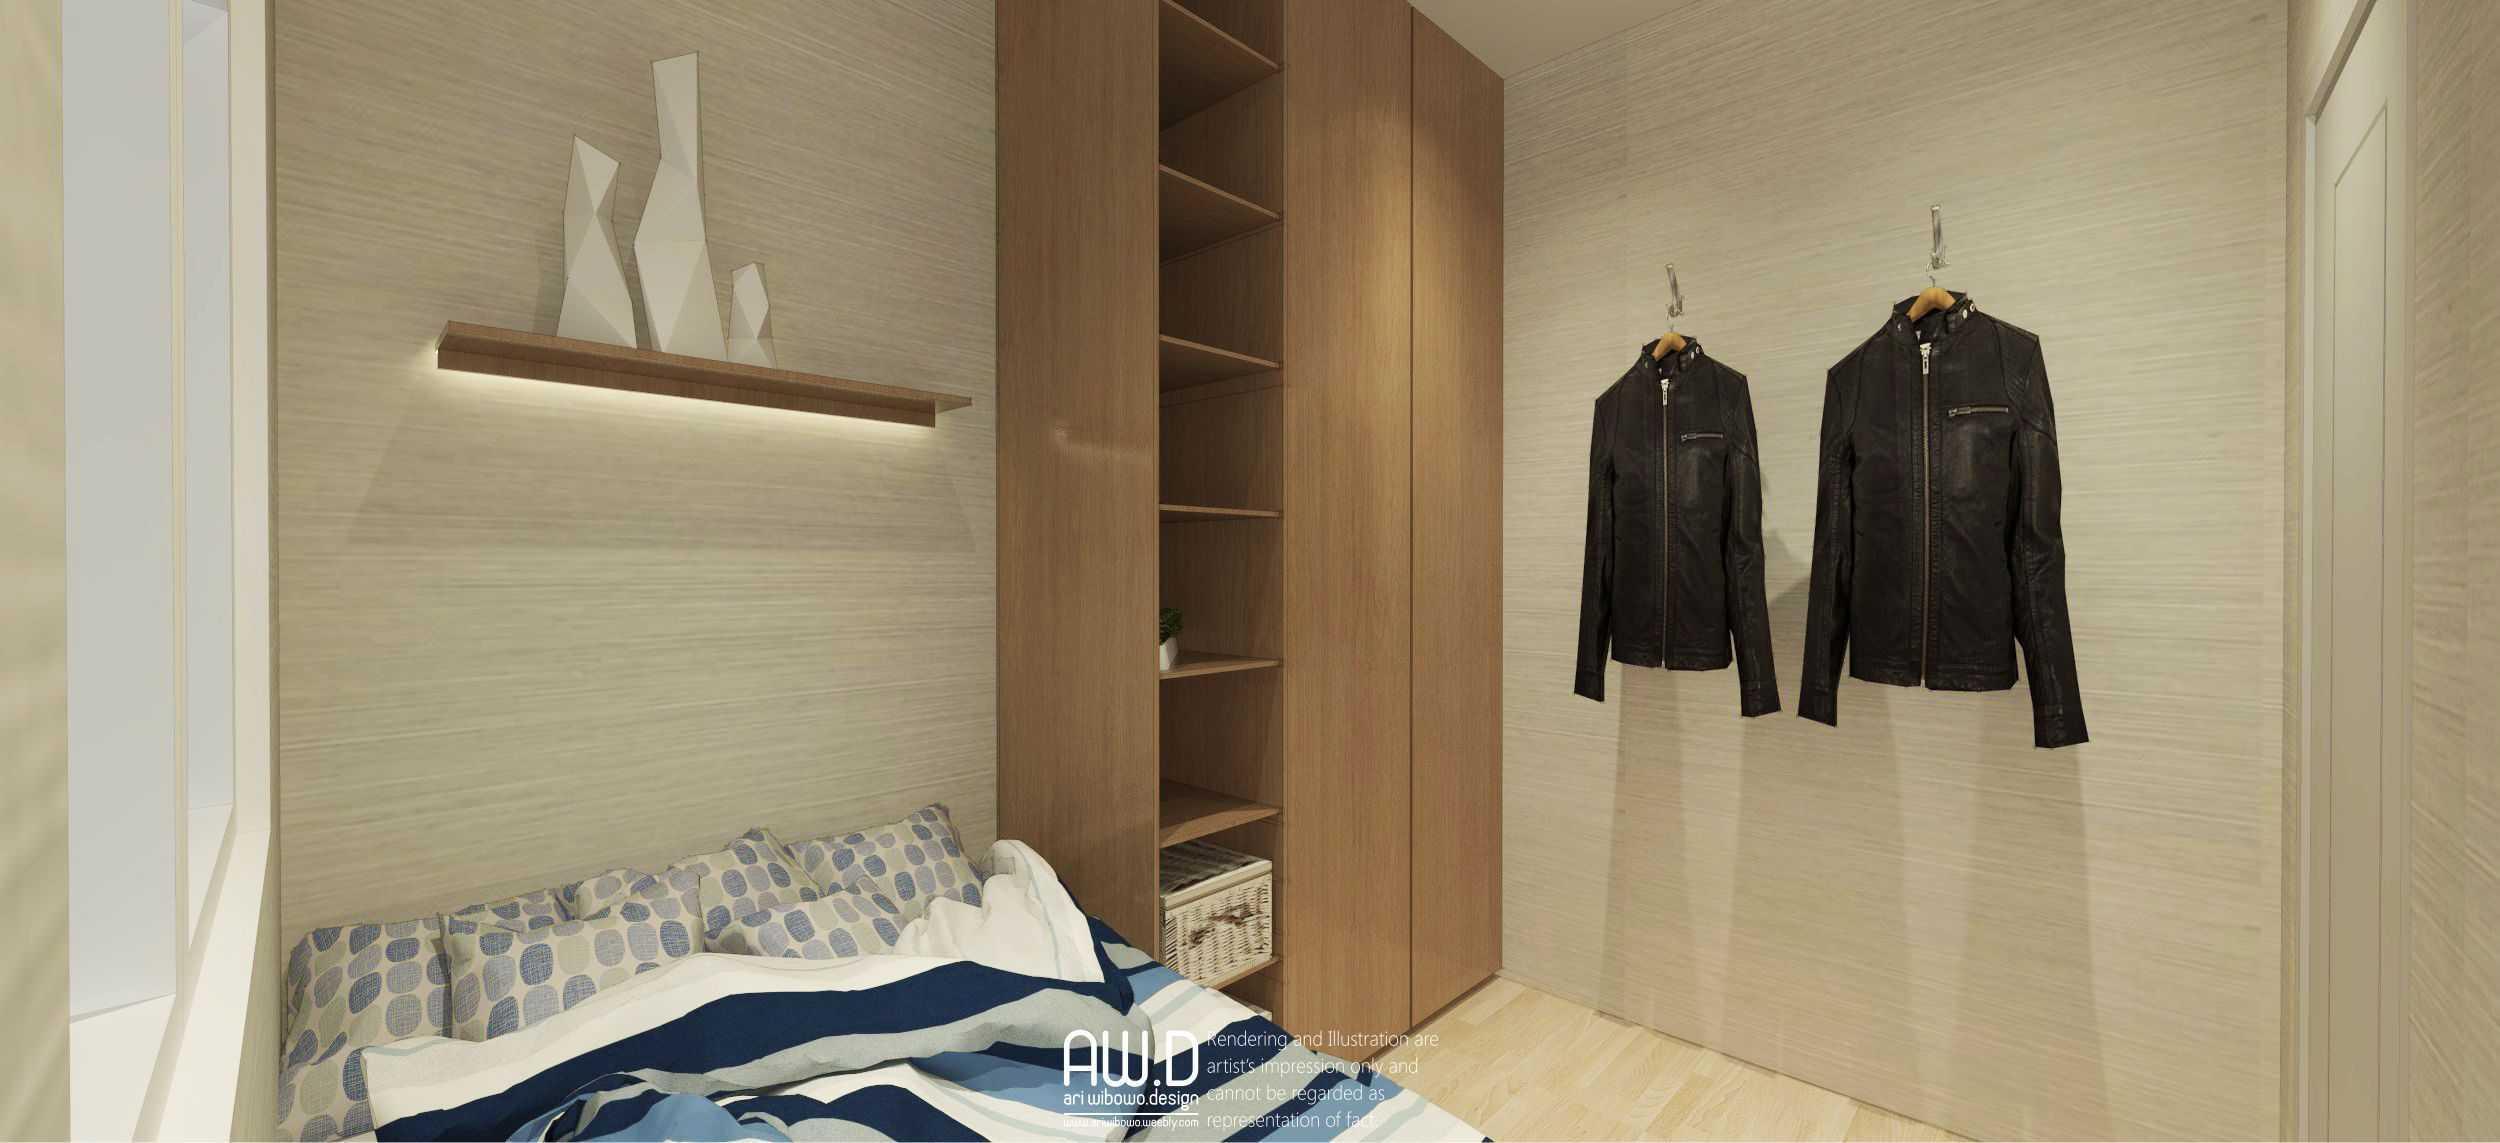 Ari Wibowo Design (Aw.d) K Apartment Jakarta Jakarta Bedroom Modern  21155